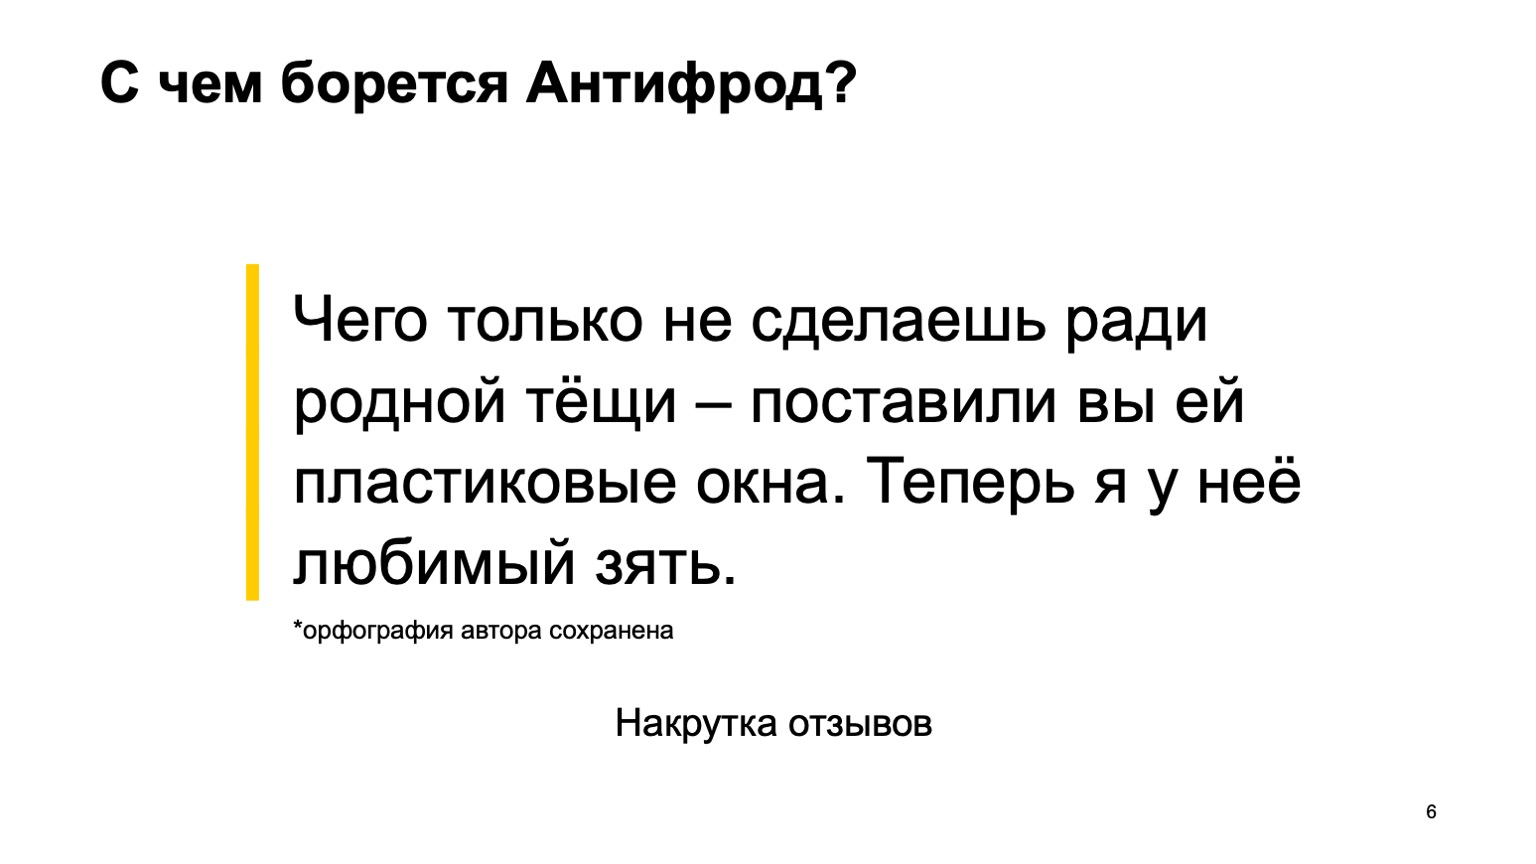 Расчет факторов в антифроде. Доклад Яндекса